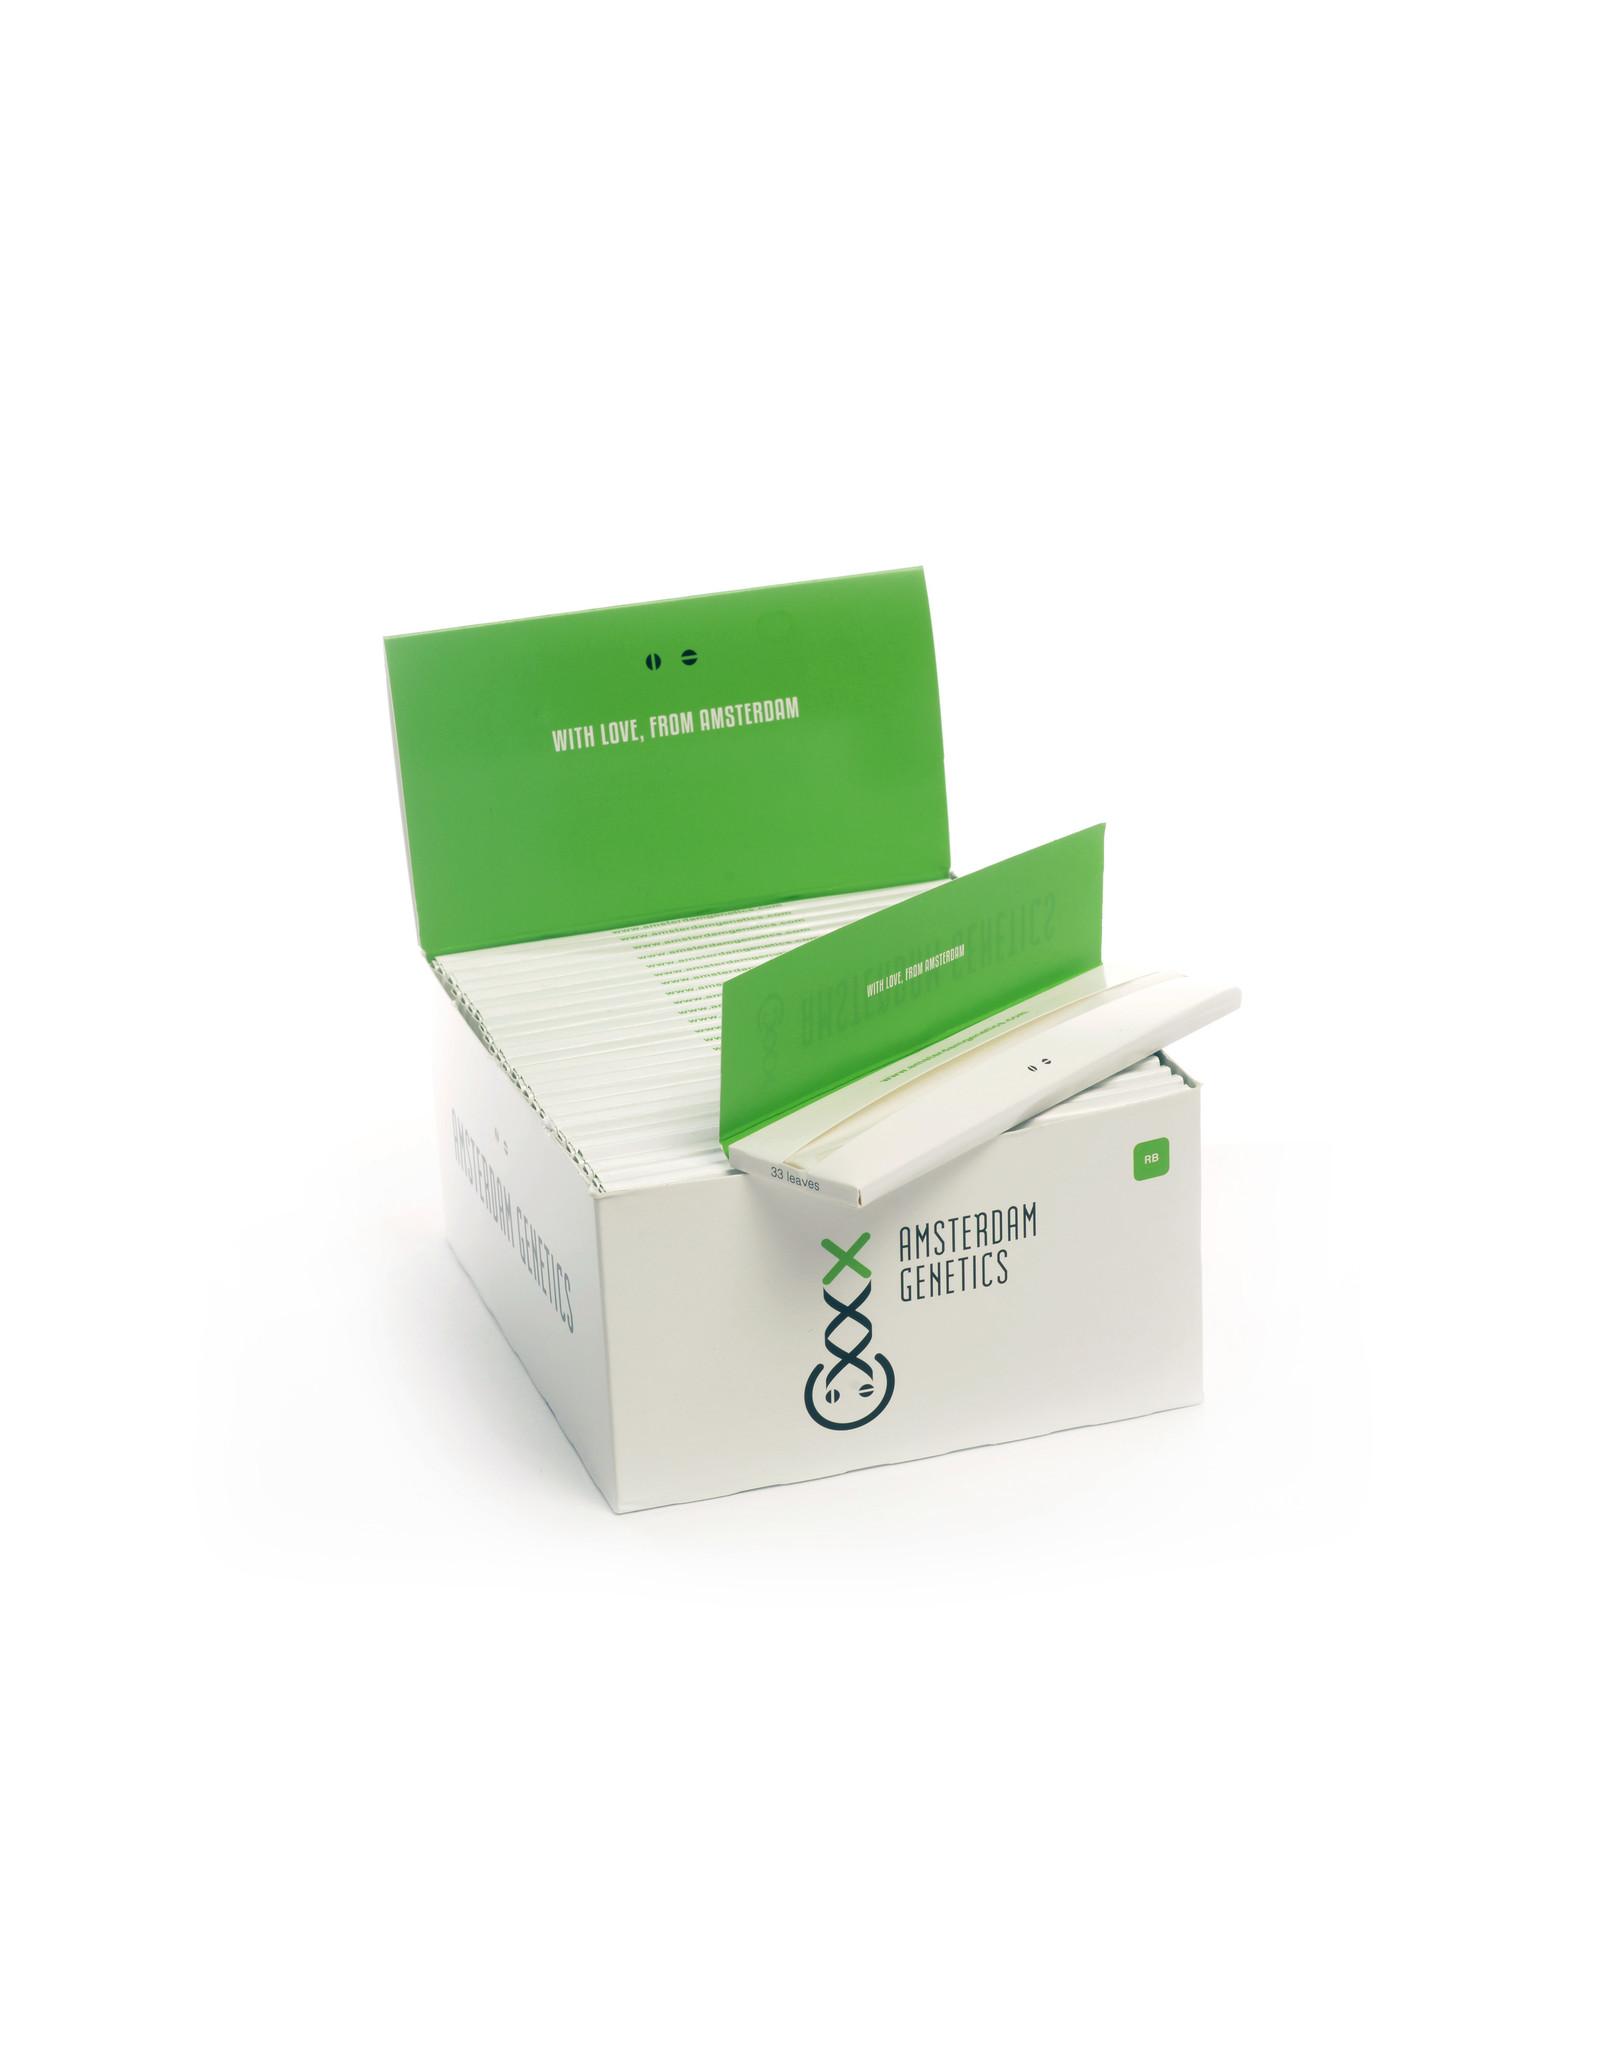 Box Papers King Size Amsterdam Genetics